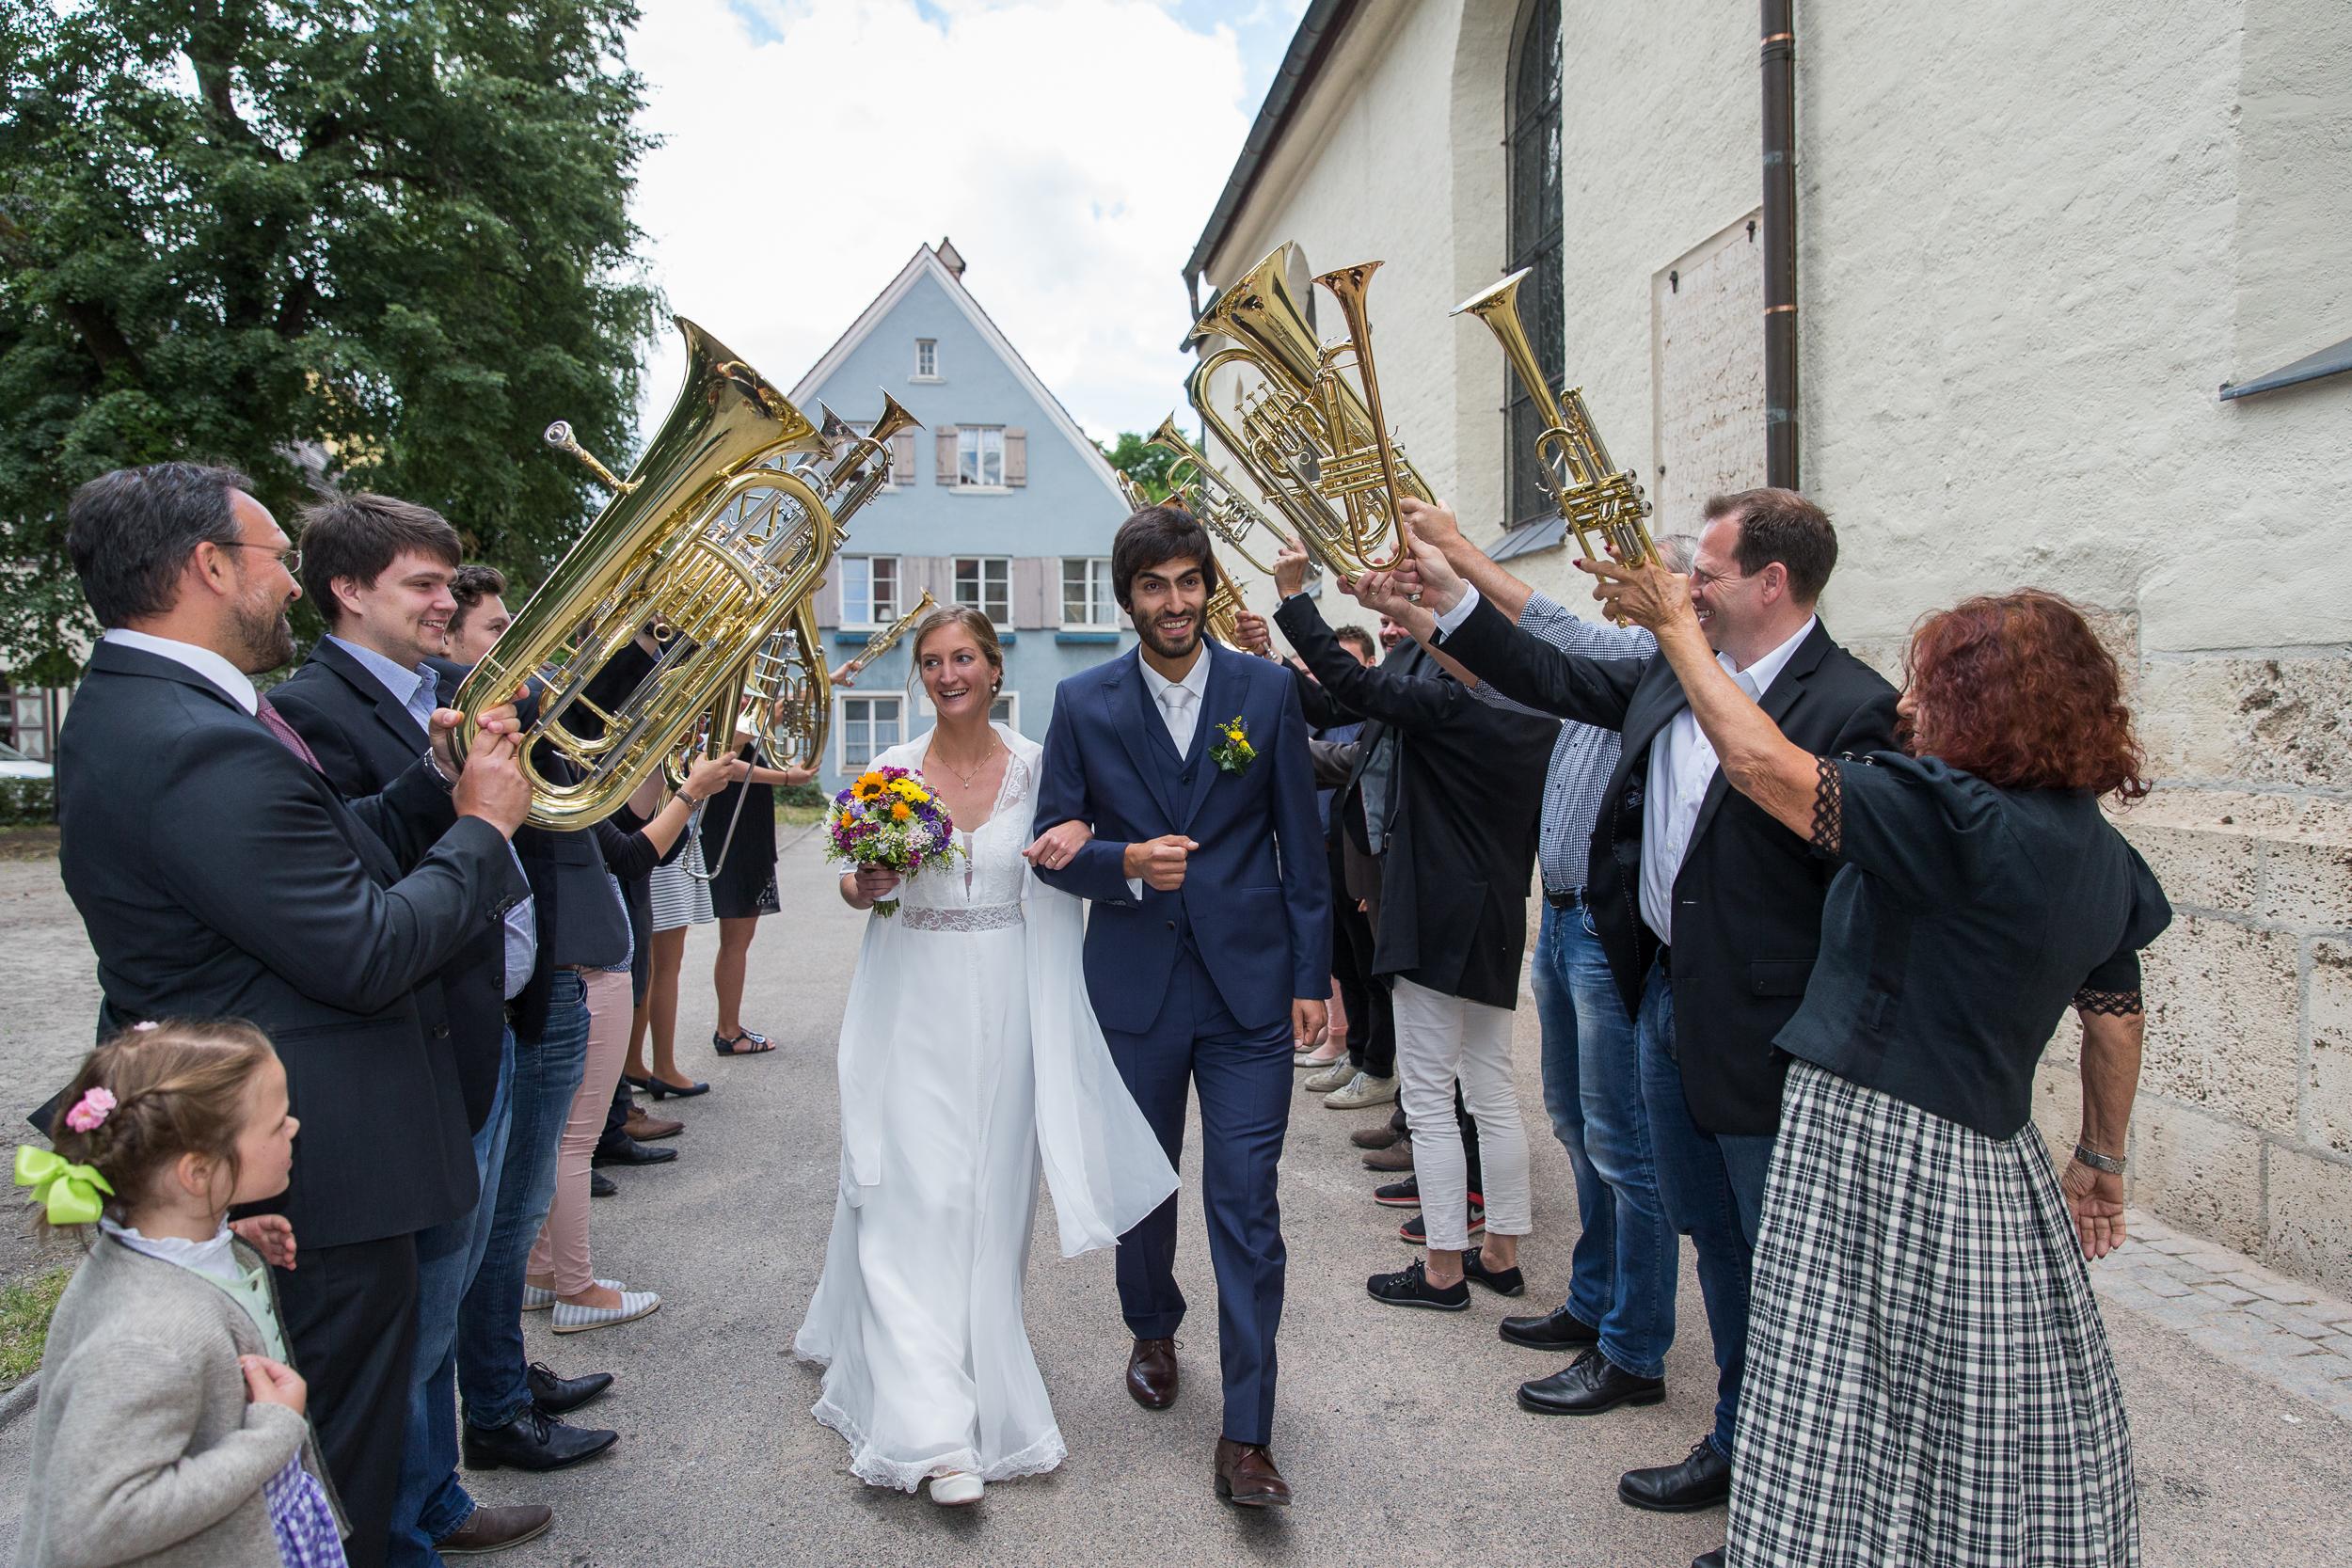 Gregg_Thorne_Wedding_Photographer_Munich_047.jpg